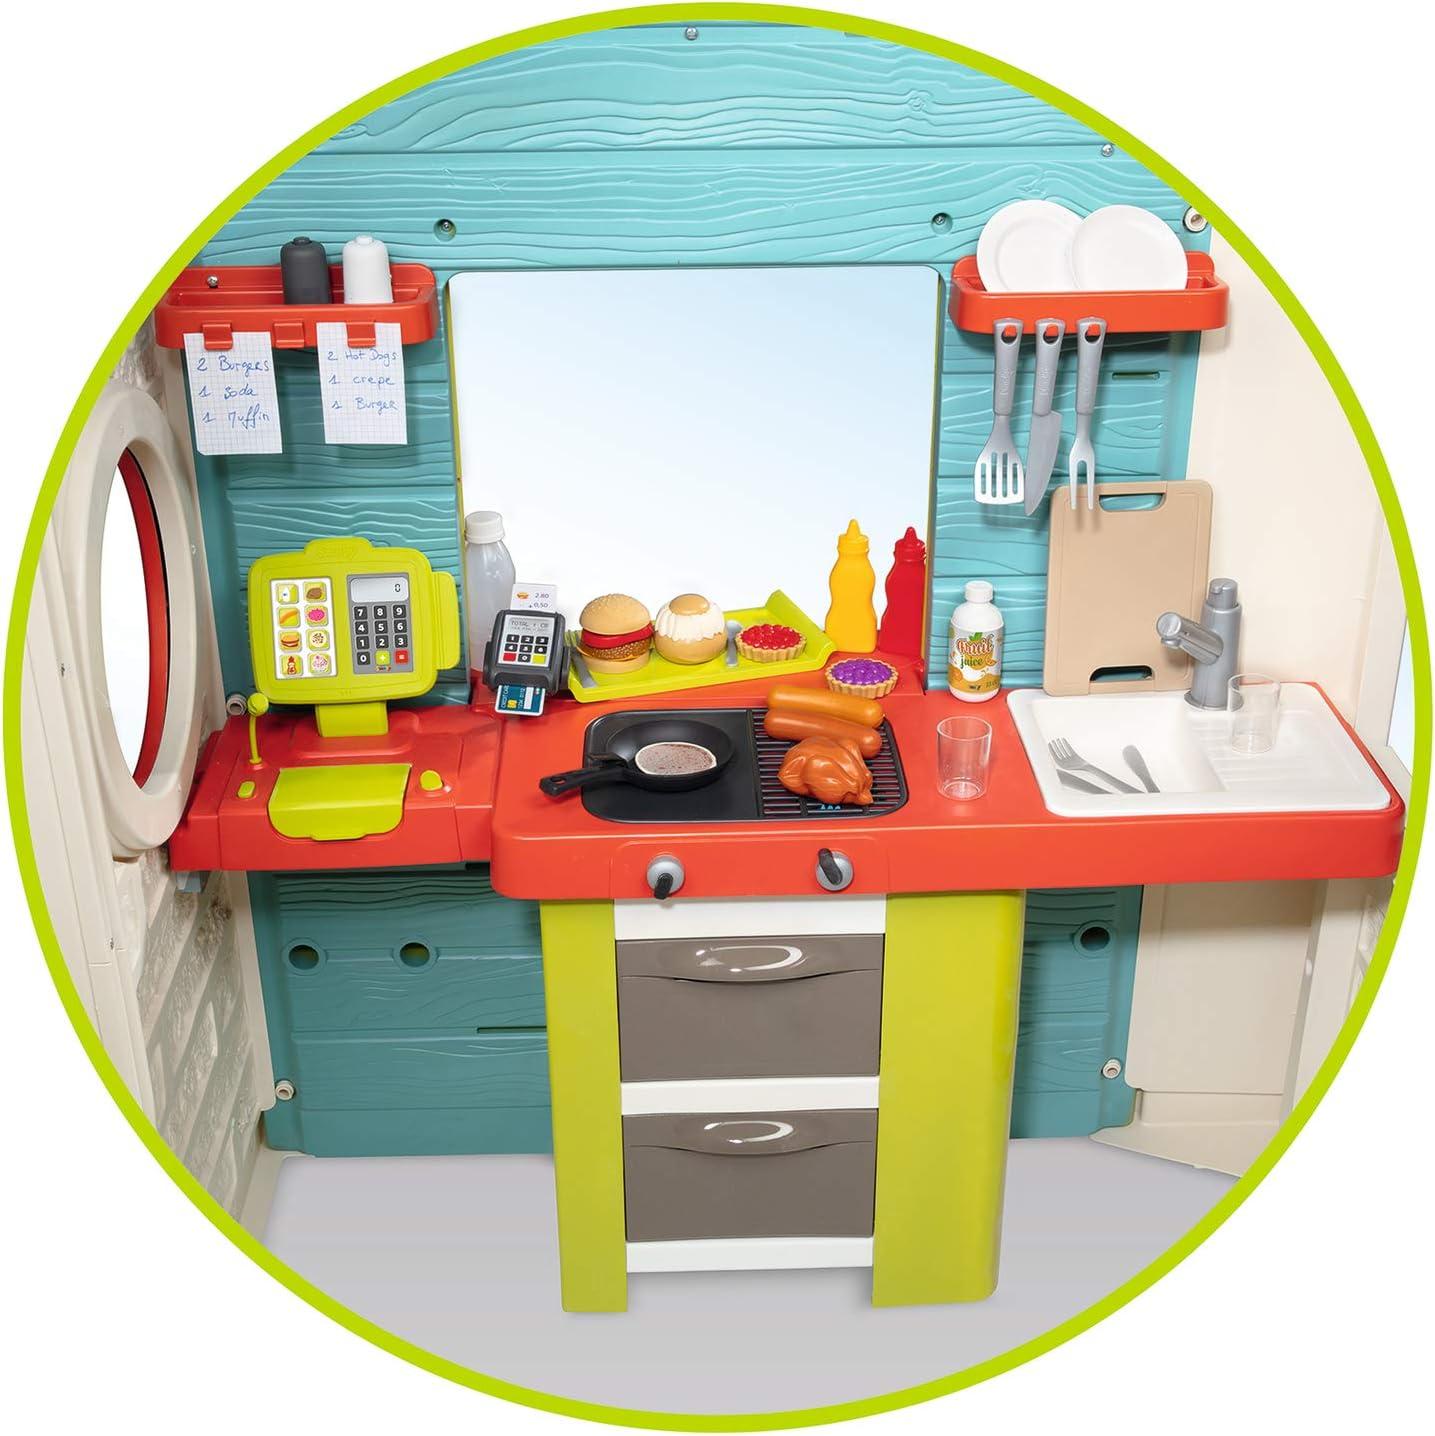 Chef House Maison de Jardin 810403 Smoby Bleu